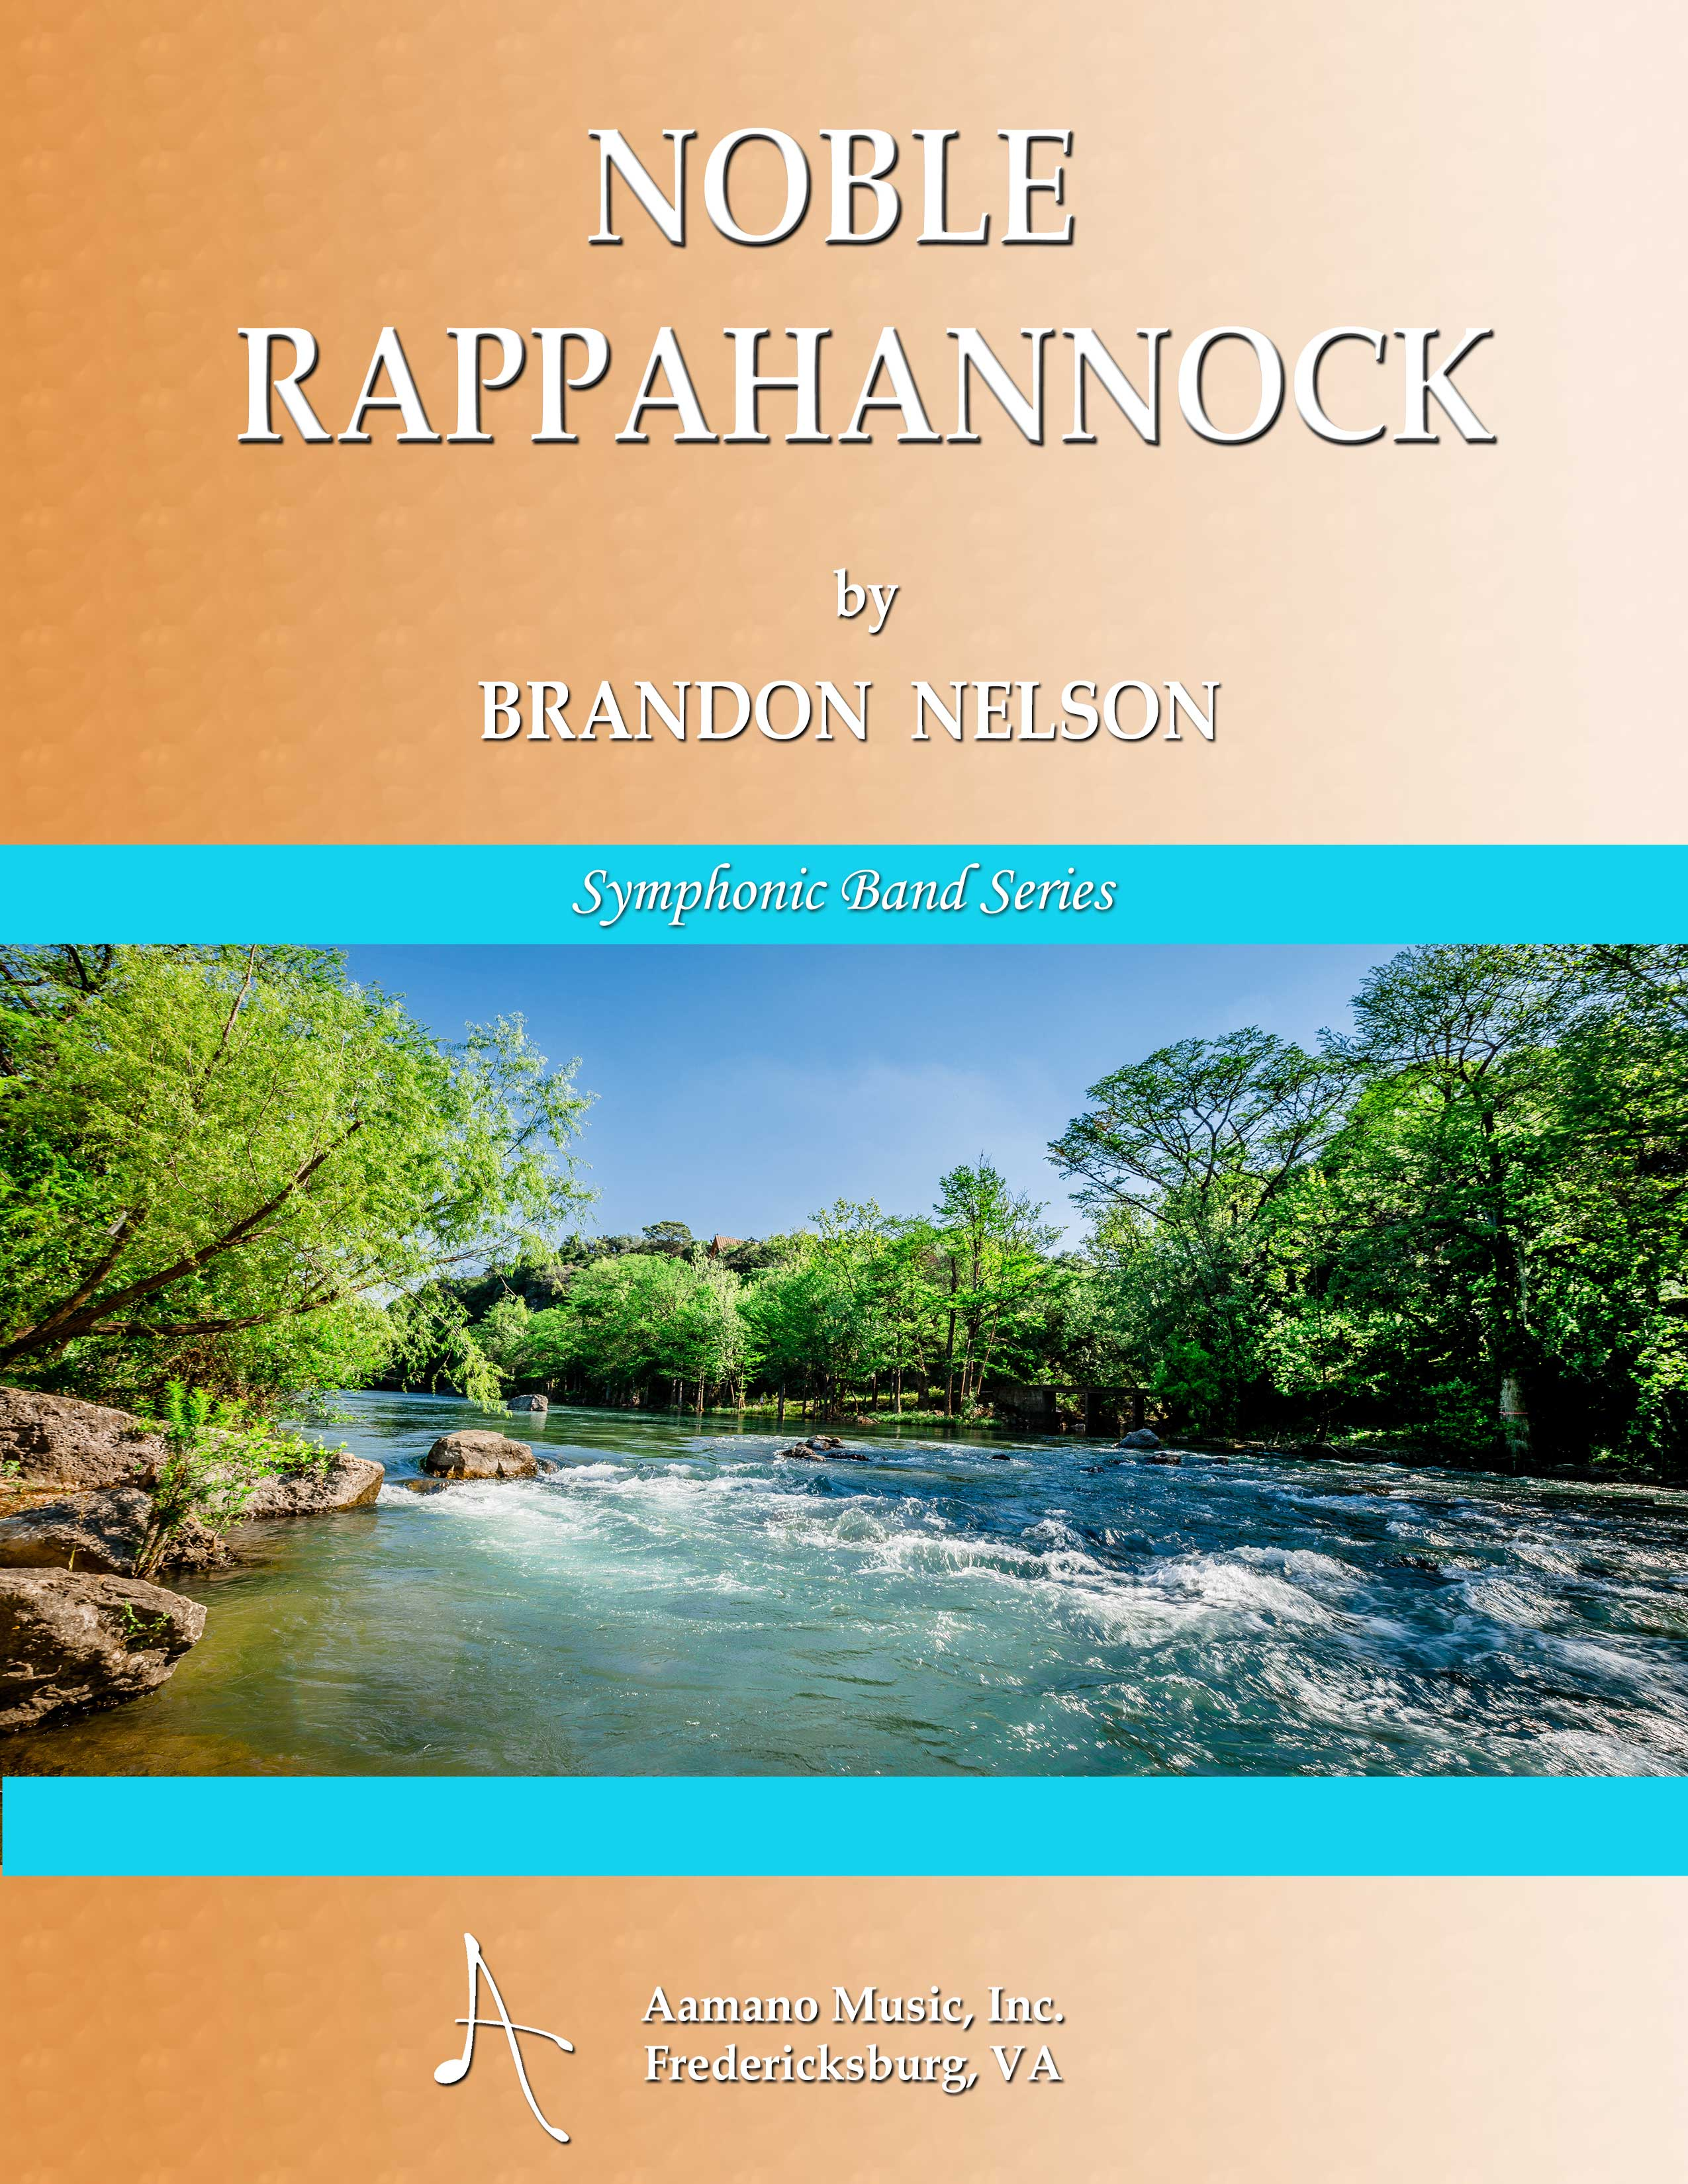 Noble Rappahannock by Brandon Nelson